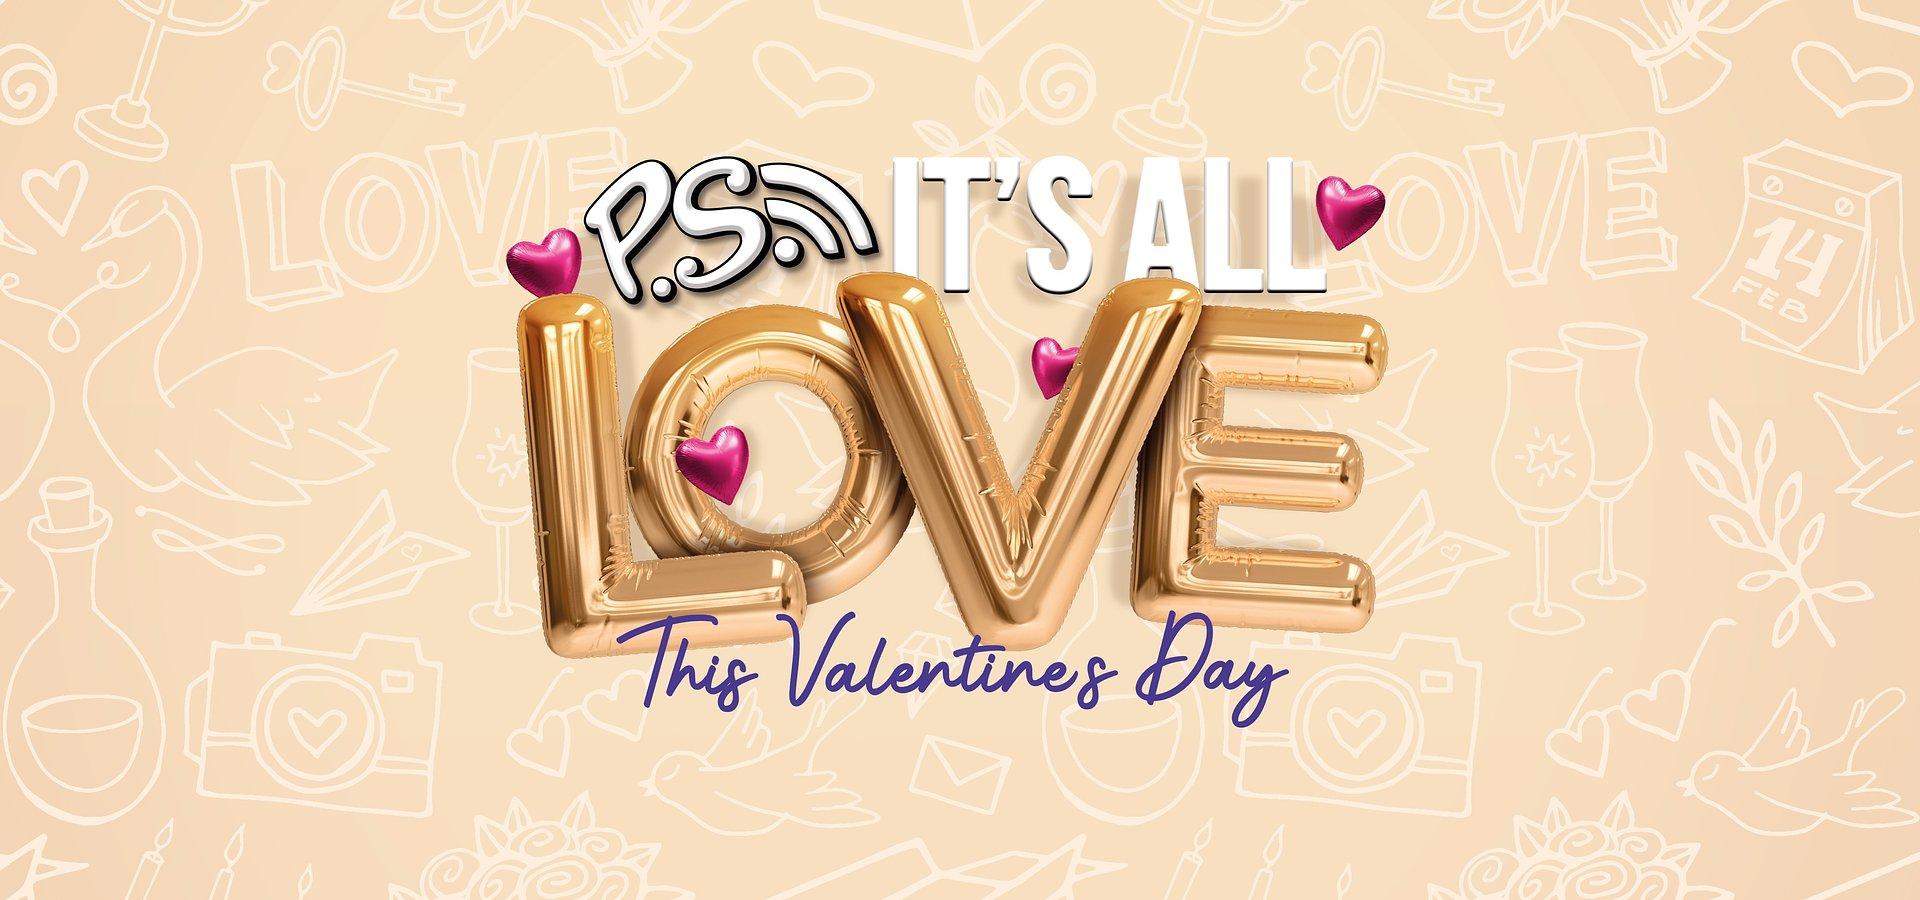 Cadbury P.S. It's All Love This Valentine's Day